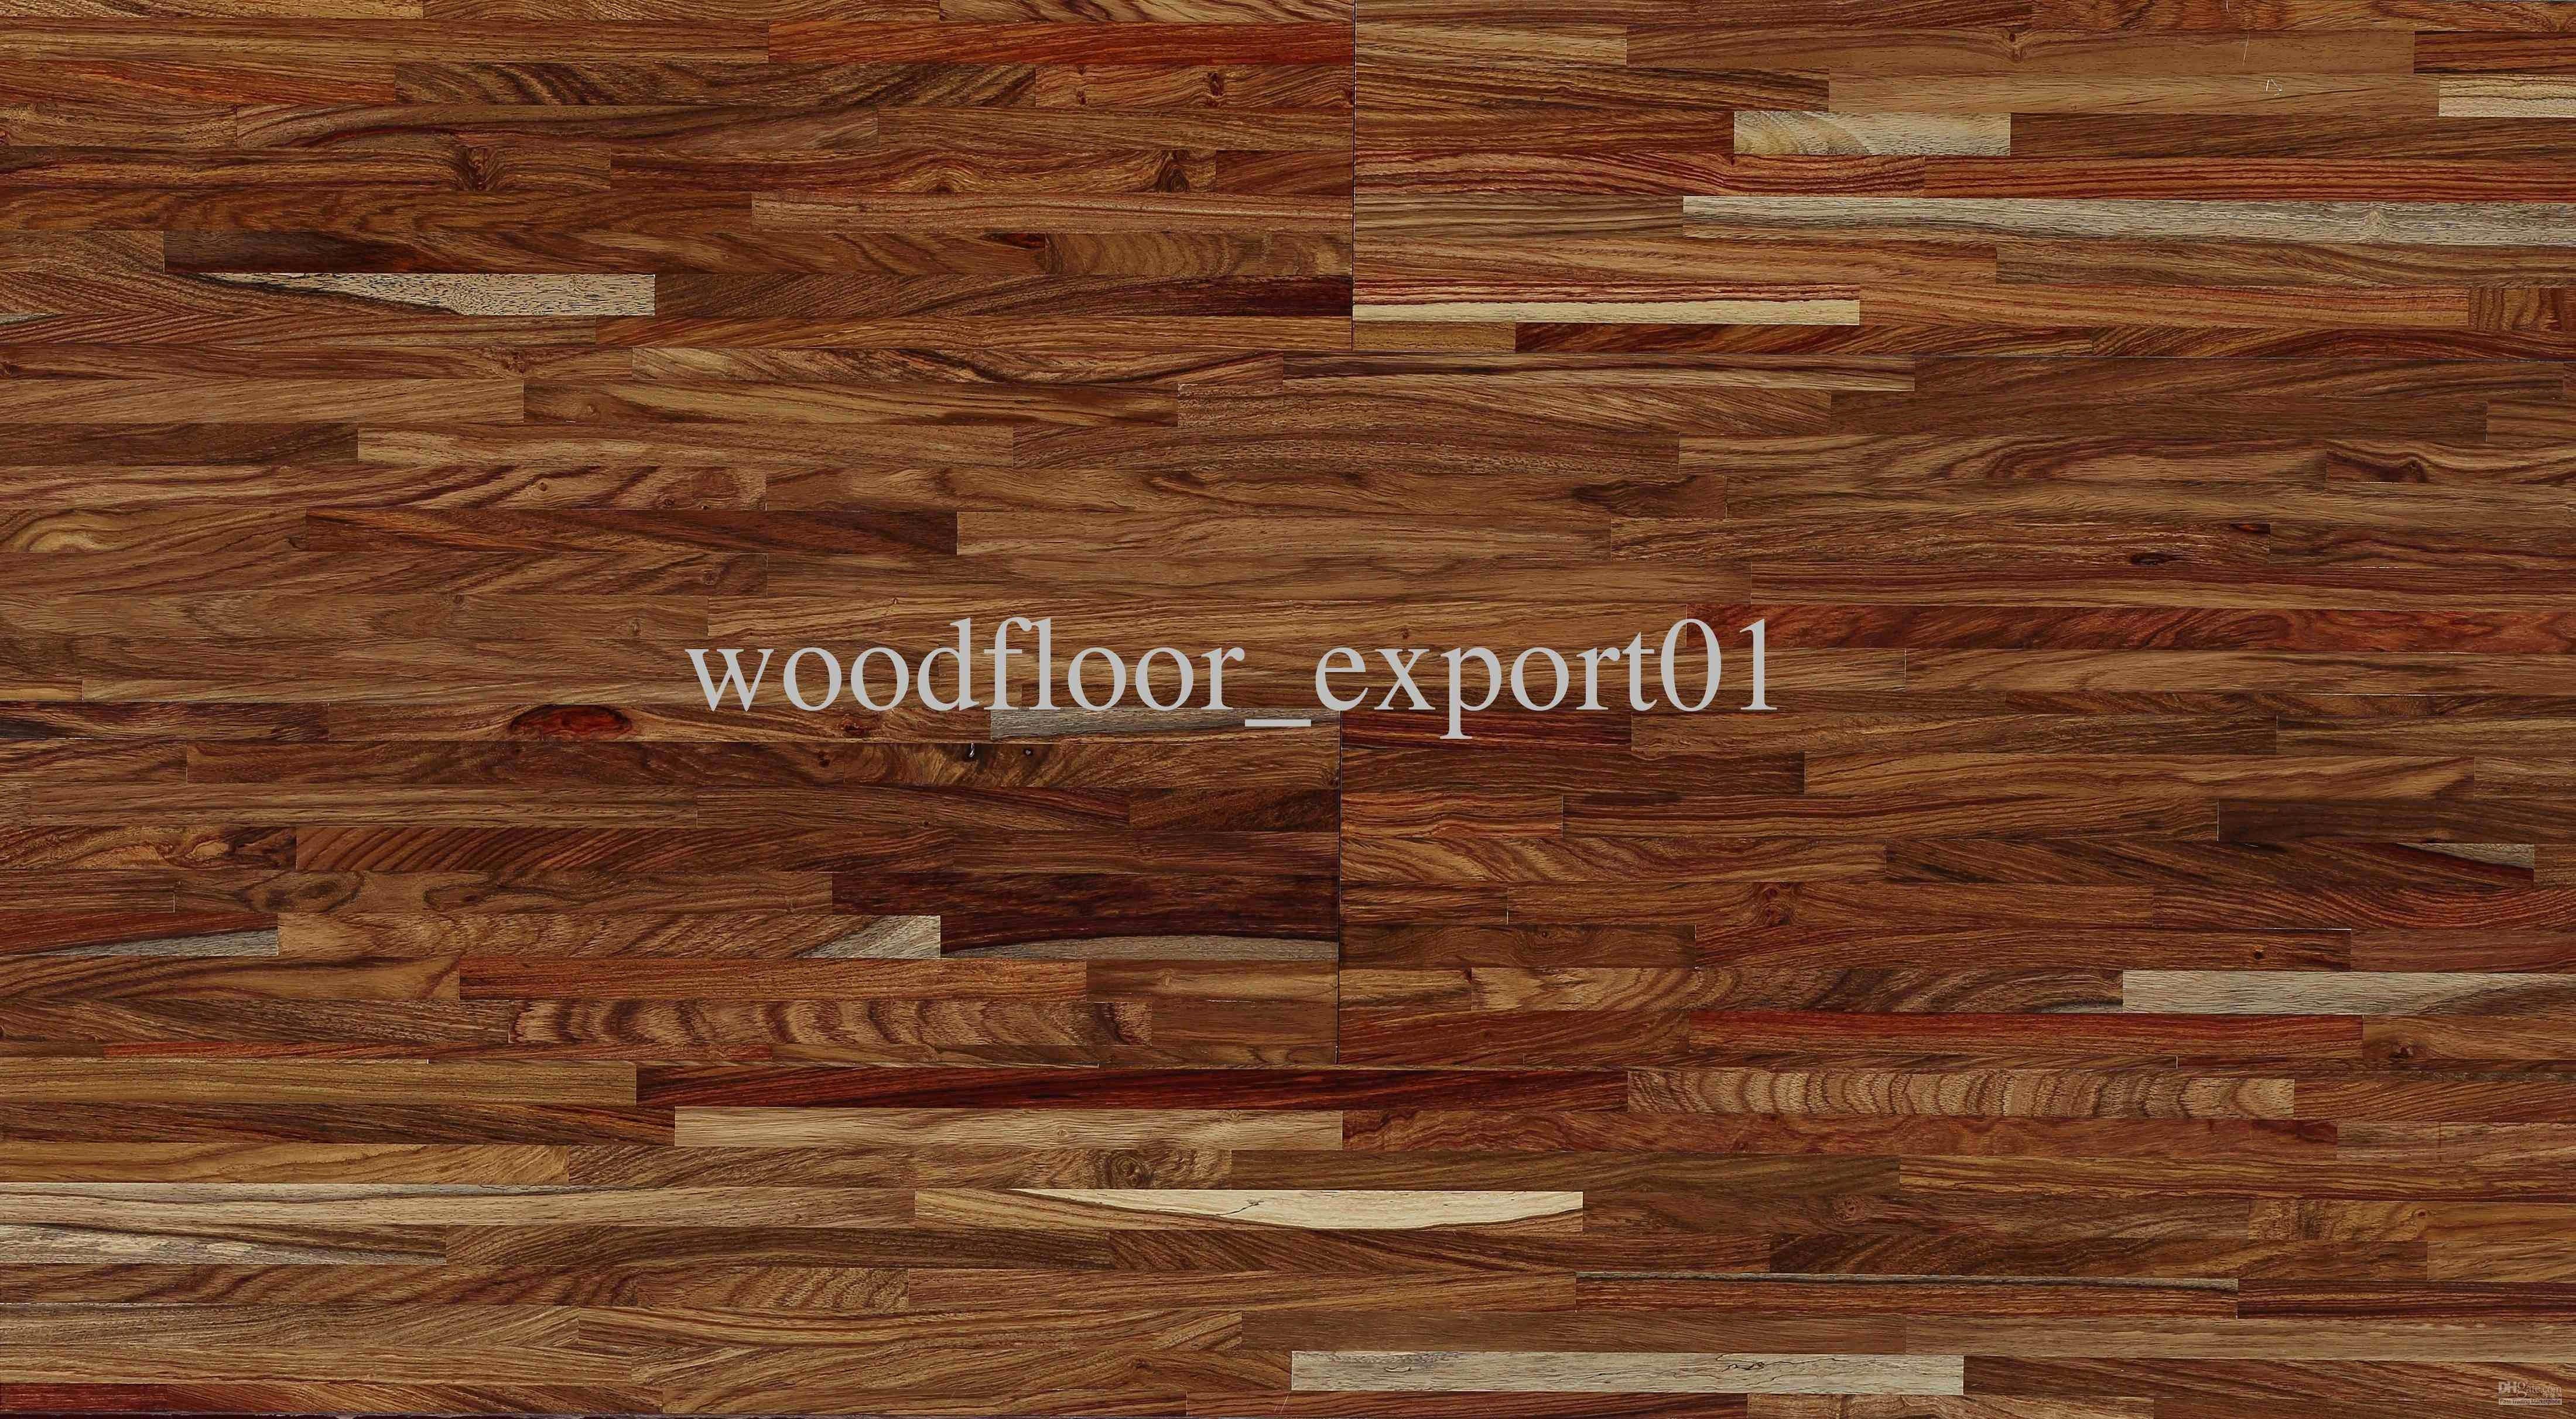 hardwood floor color transition of 15 unique types of hardwood flooring image dizpos com throughout types of hardwood flooring awesome 50 inspirational sanding and refinishing hardwood floors graphics image of 15